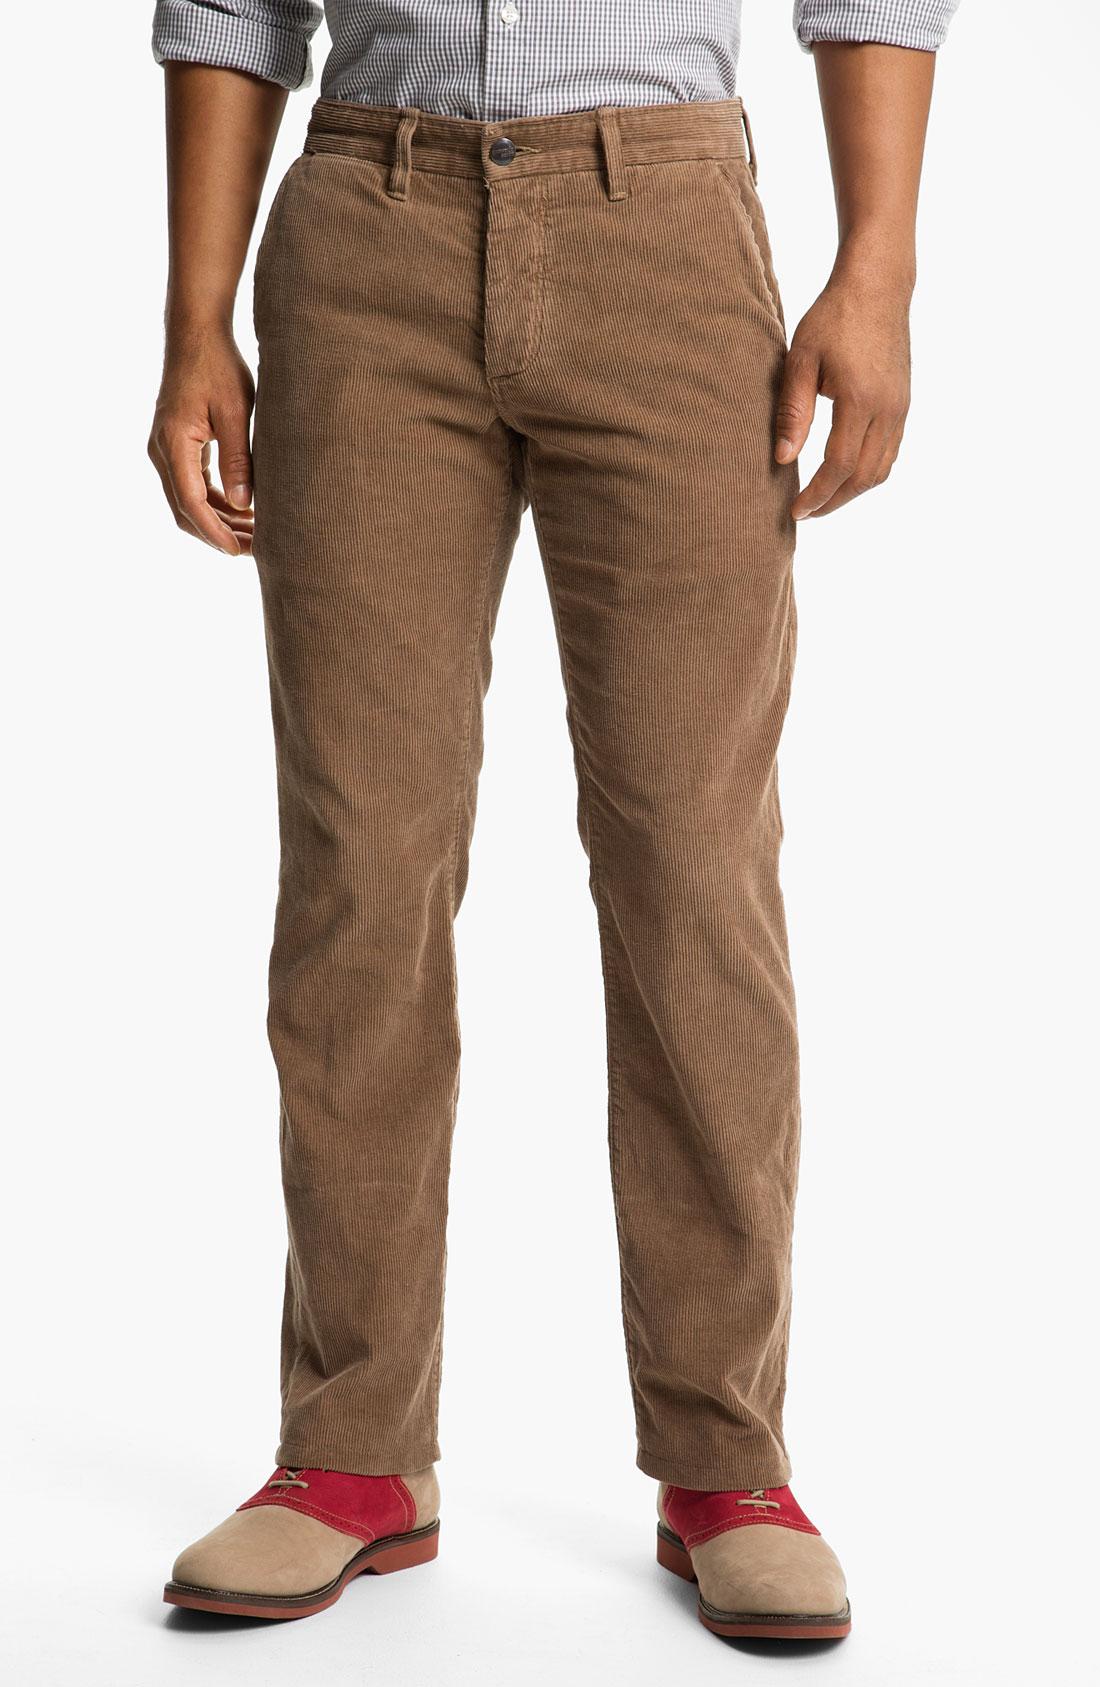 New Levis Tan Corduroy Demi Curve ID Slim Leg Pants For Women  Choose